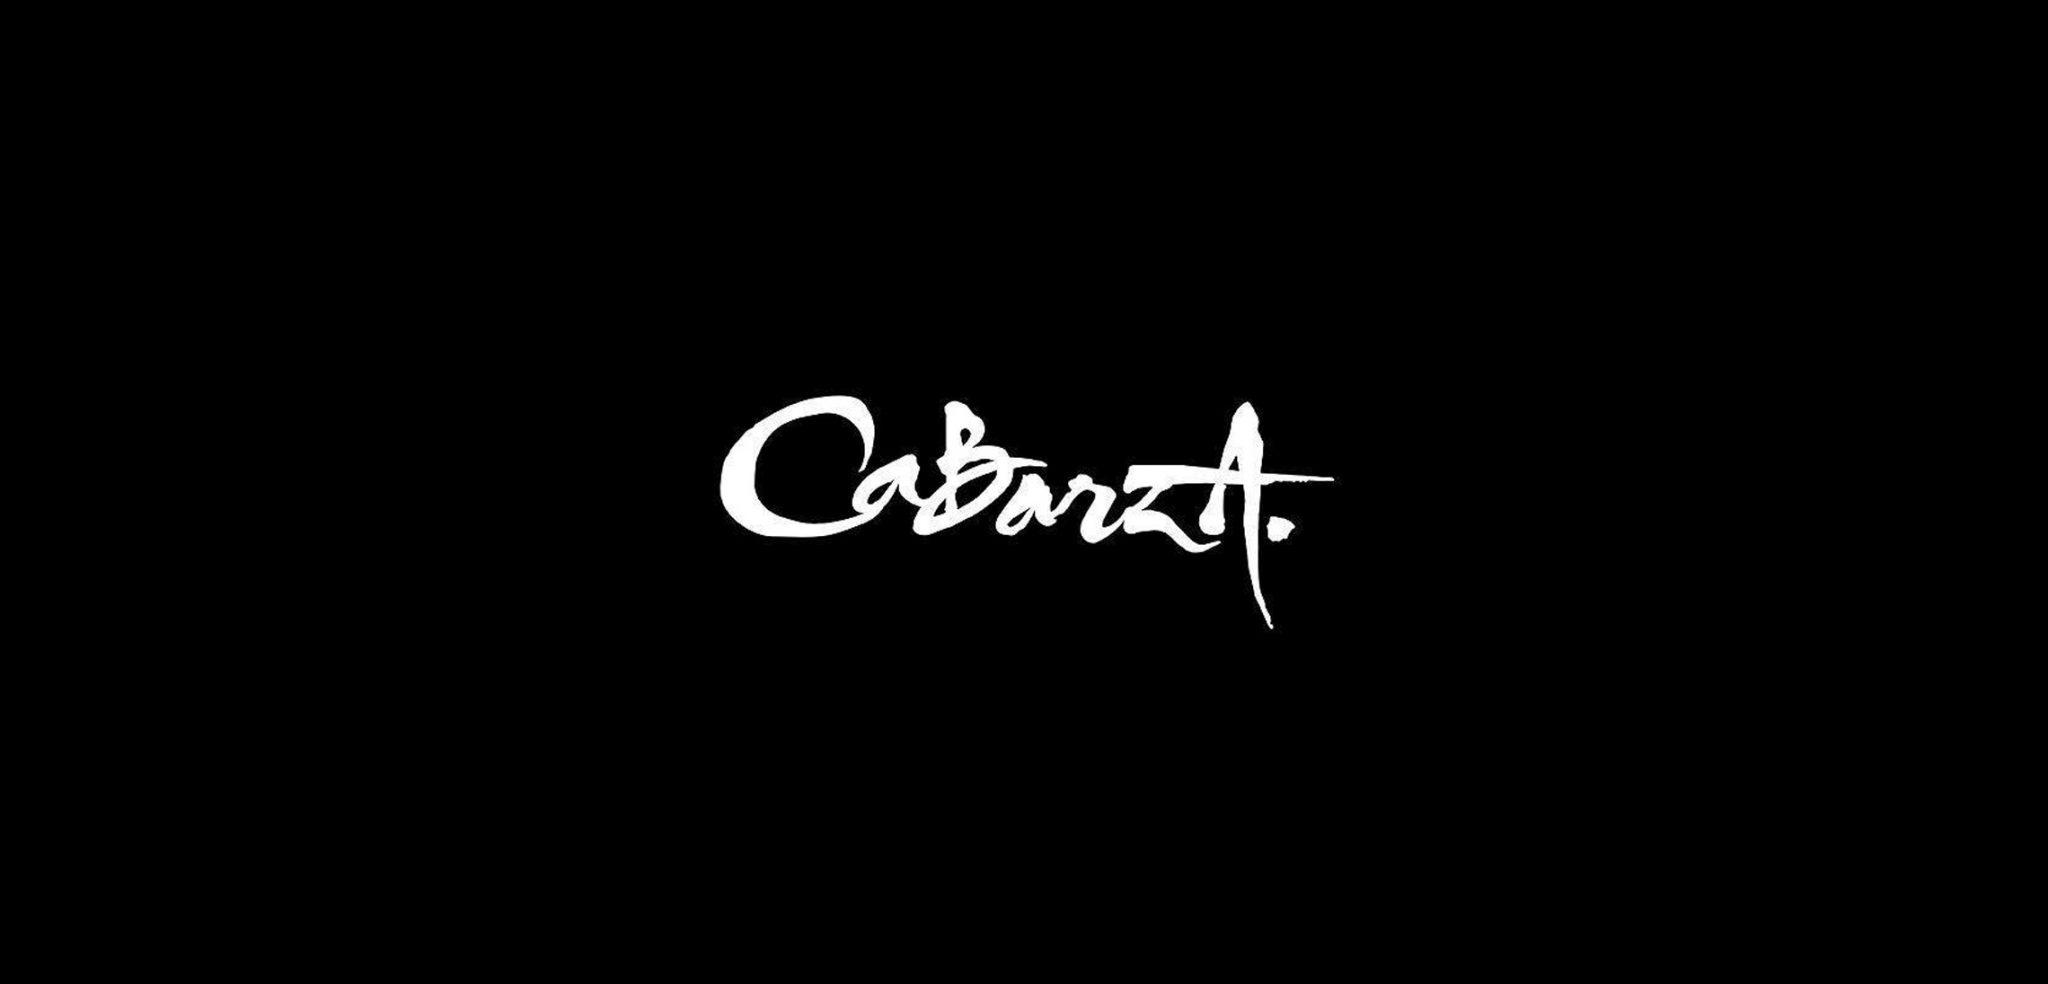 Cabarza - Want You EP hero